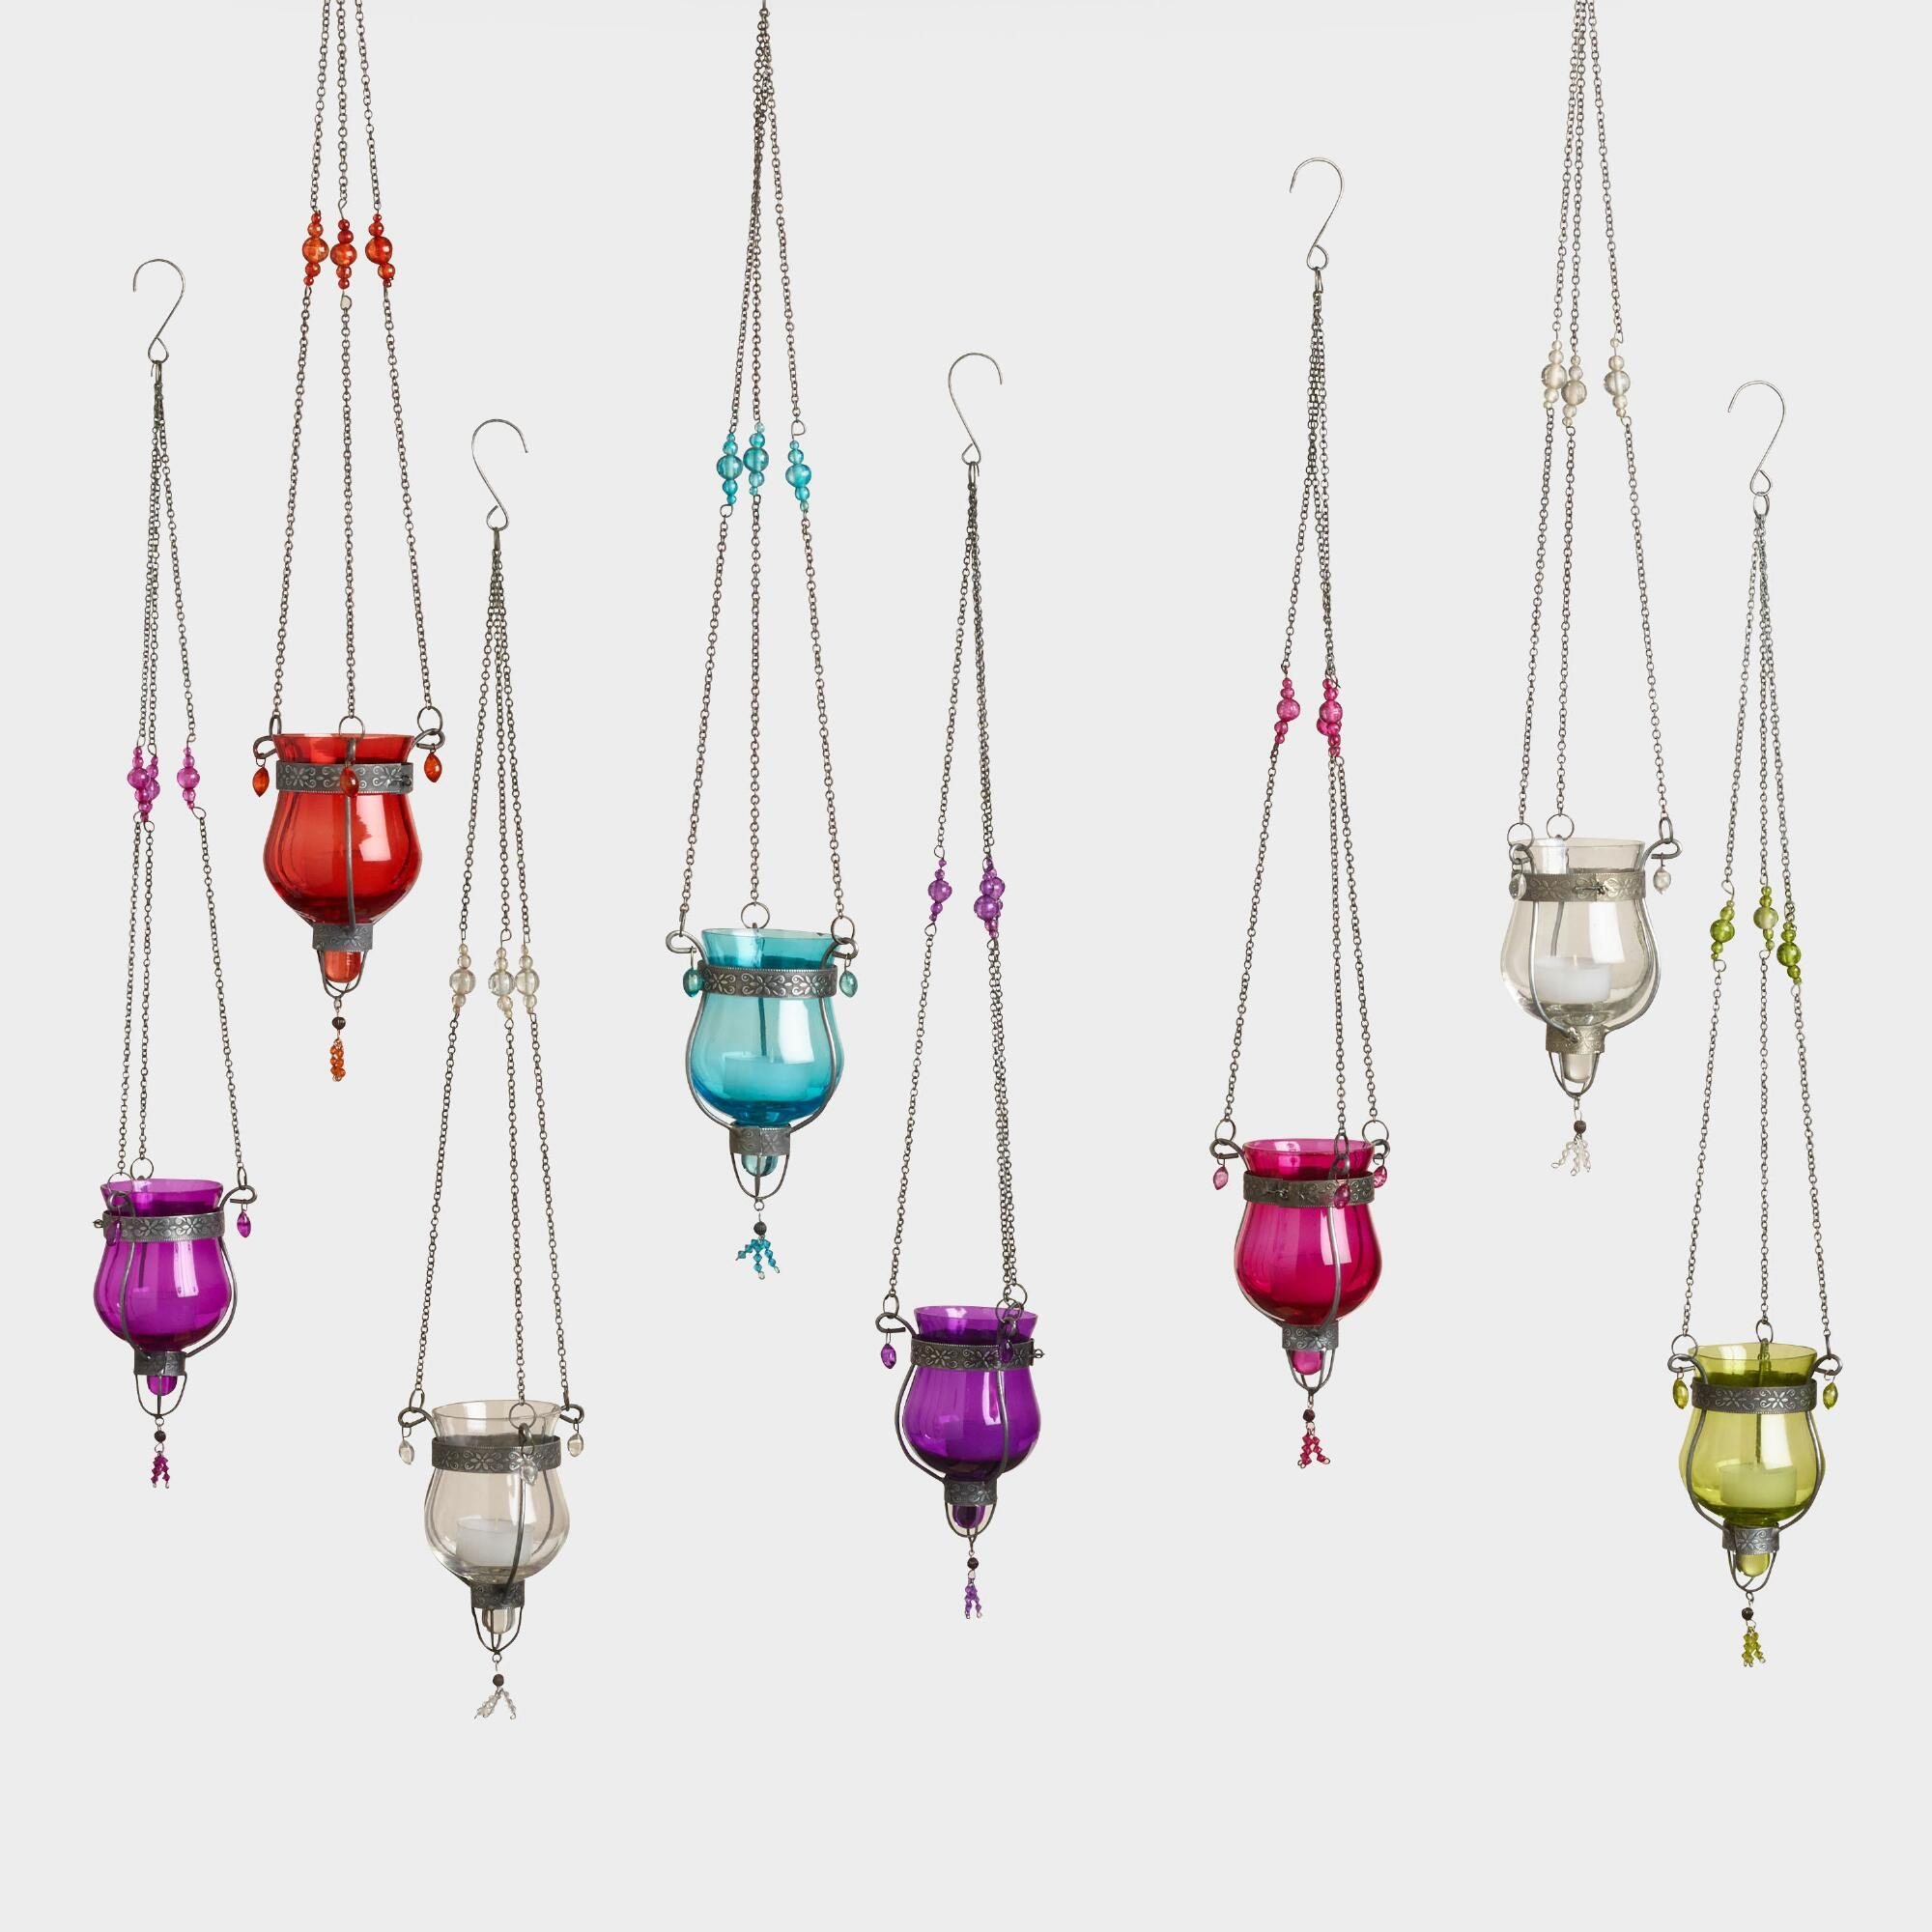 Glass Dahlia Hanging Tealight Lanterns Set of 8 by World Market